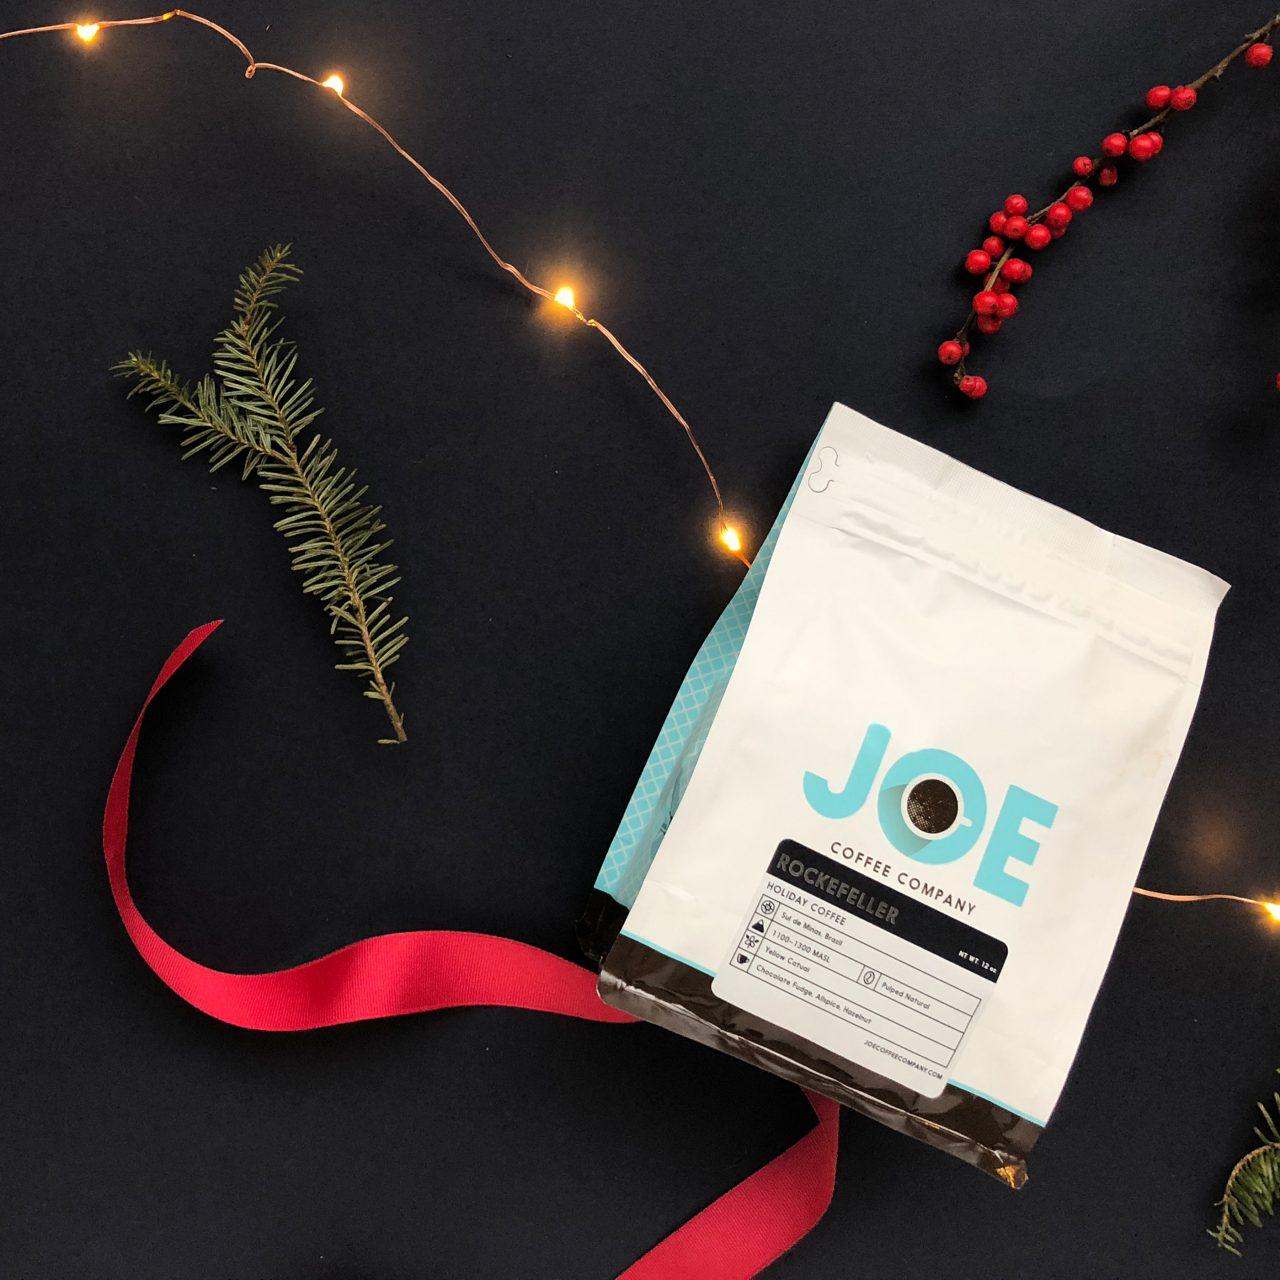 Rockefeller holiday coffee bag